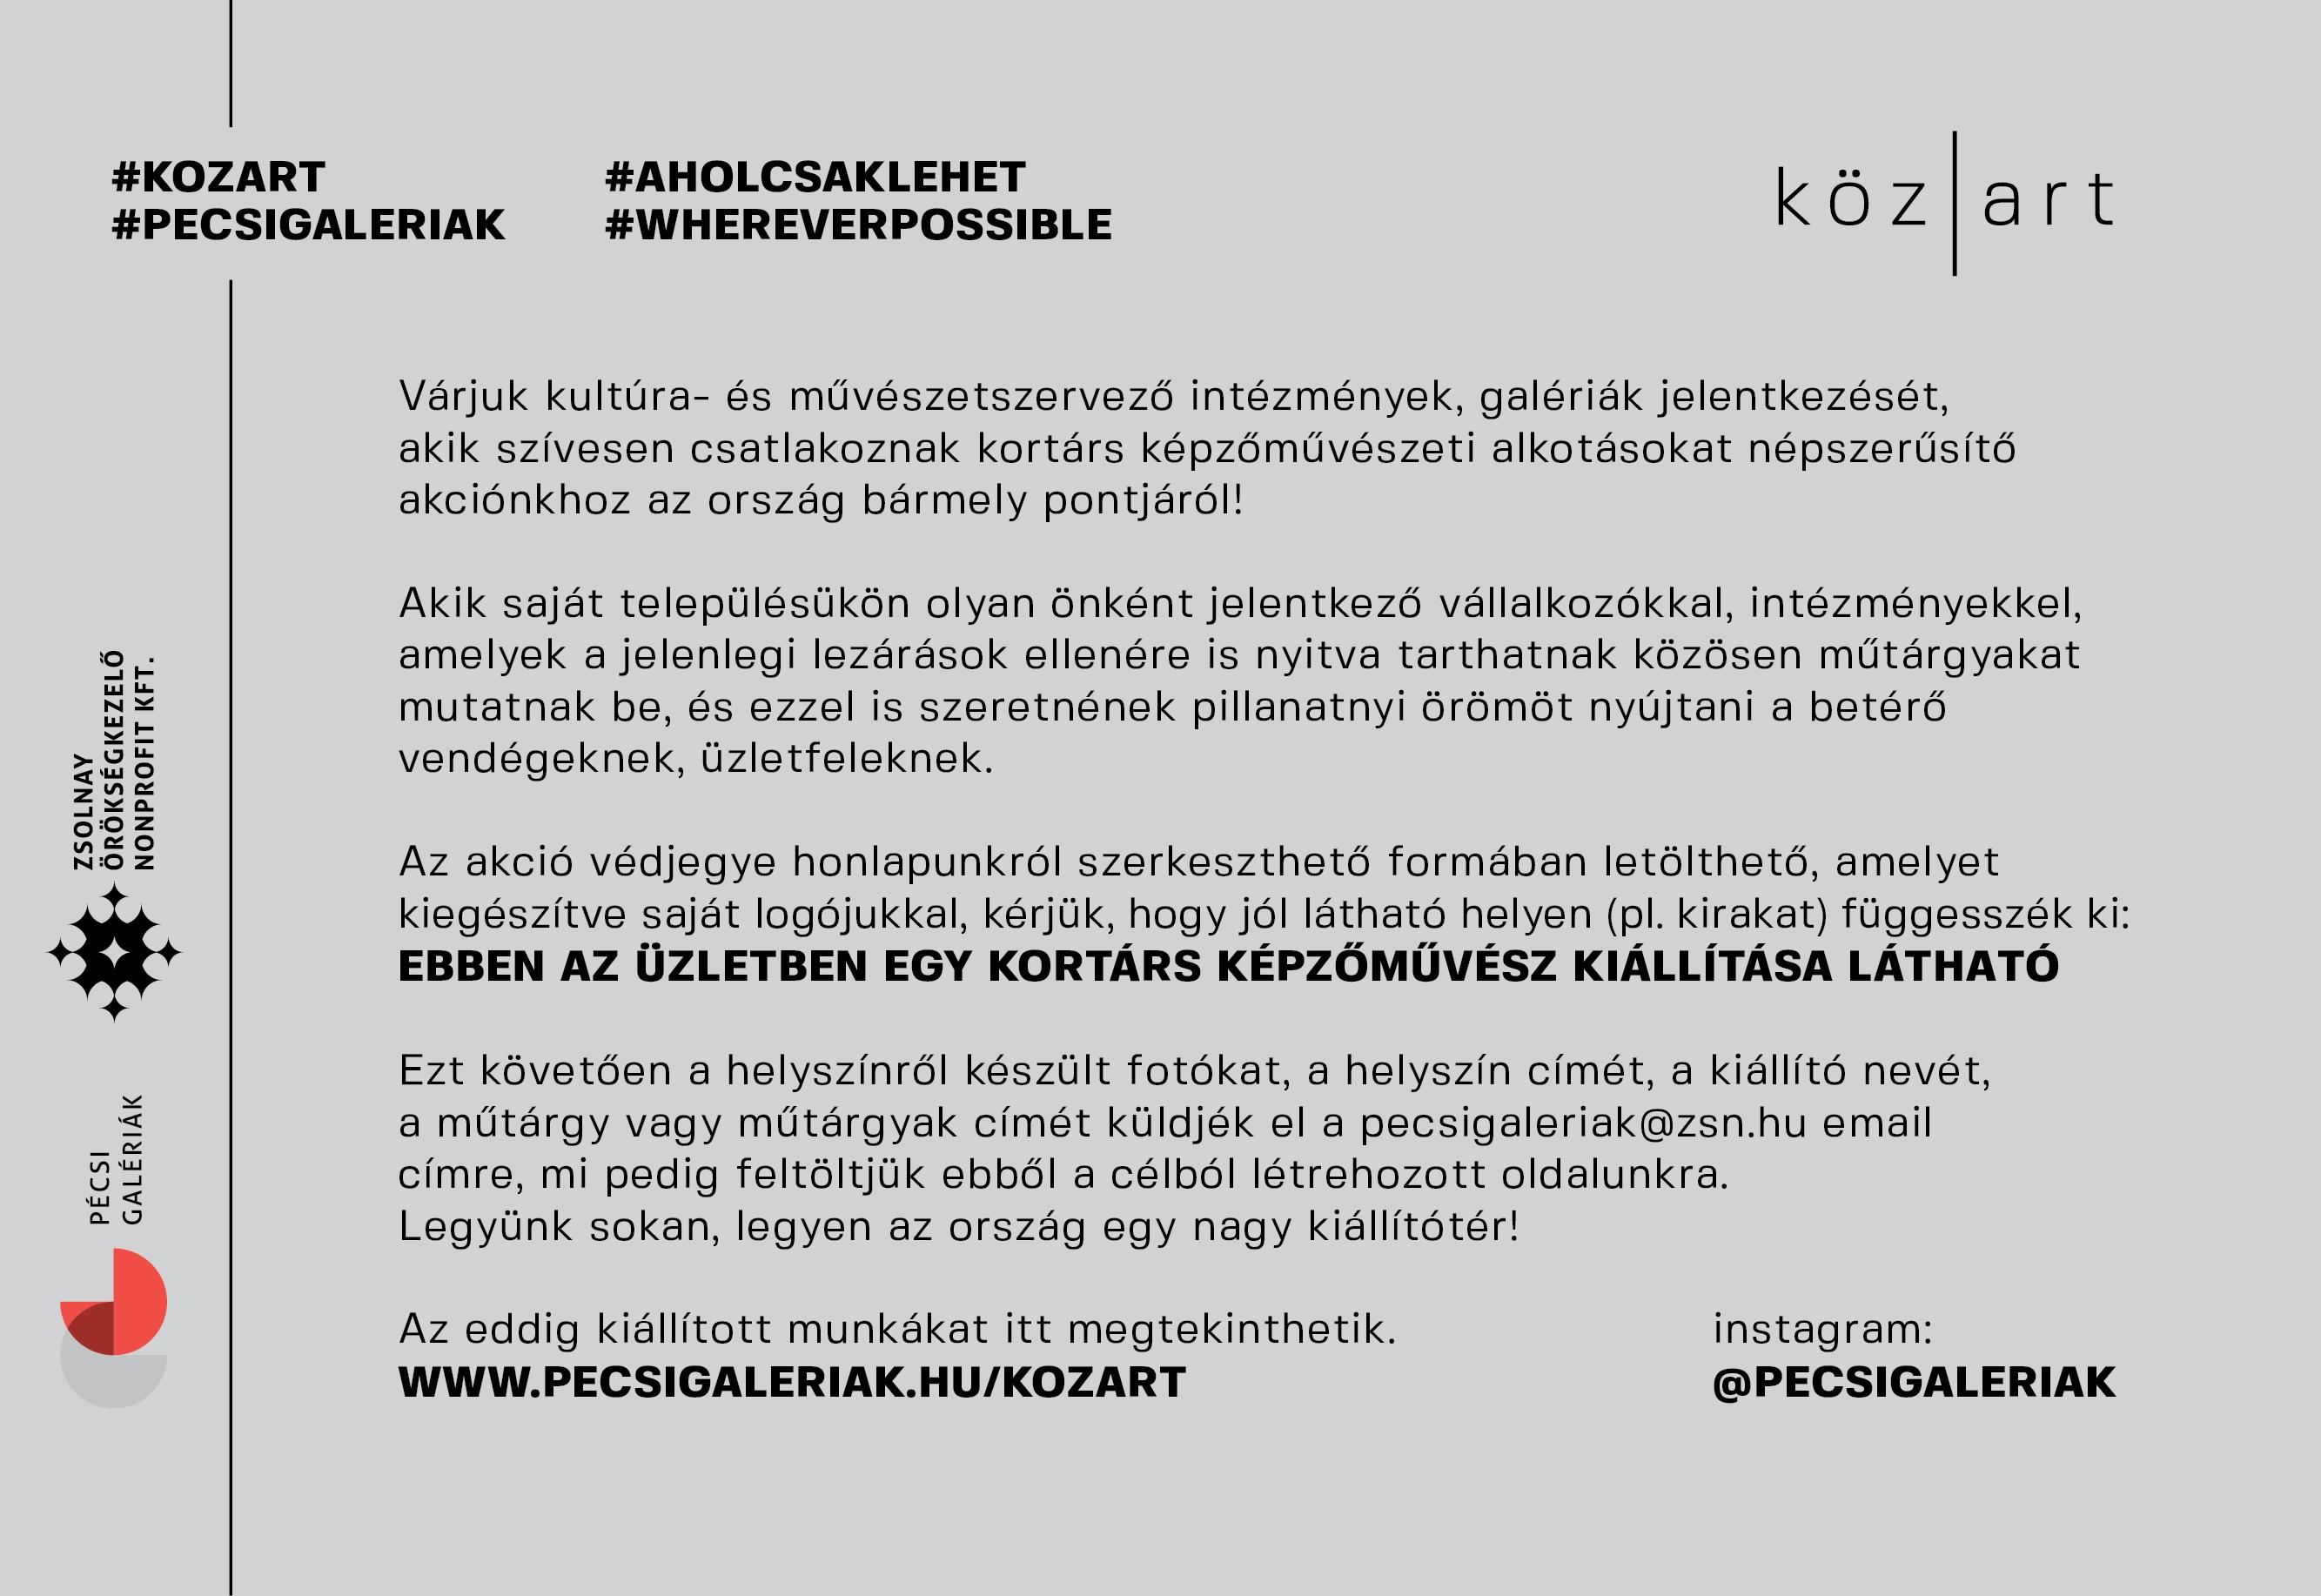 kozart_felhivas_2